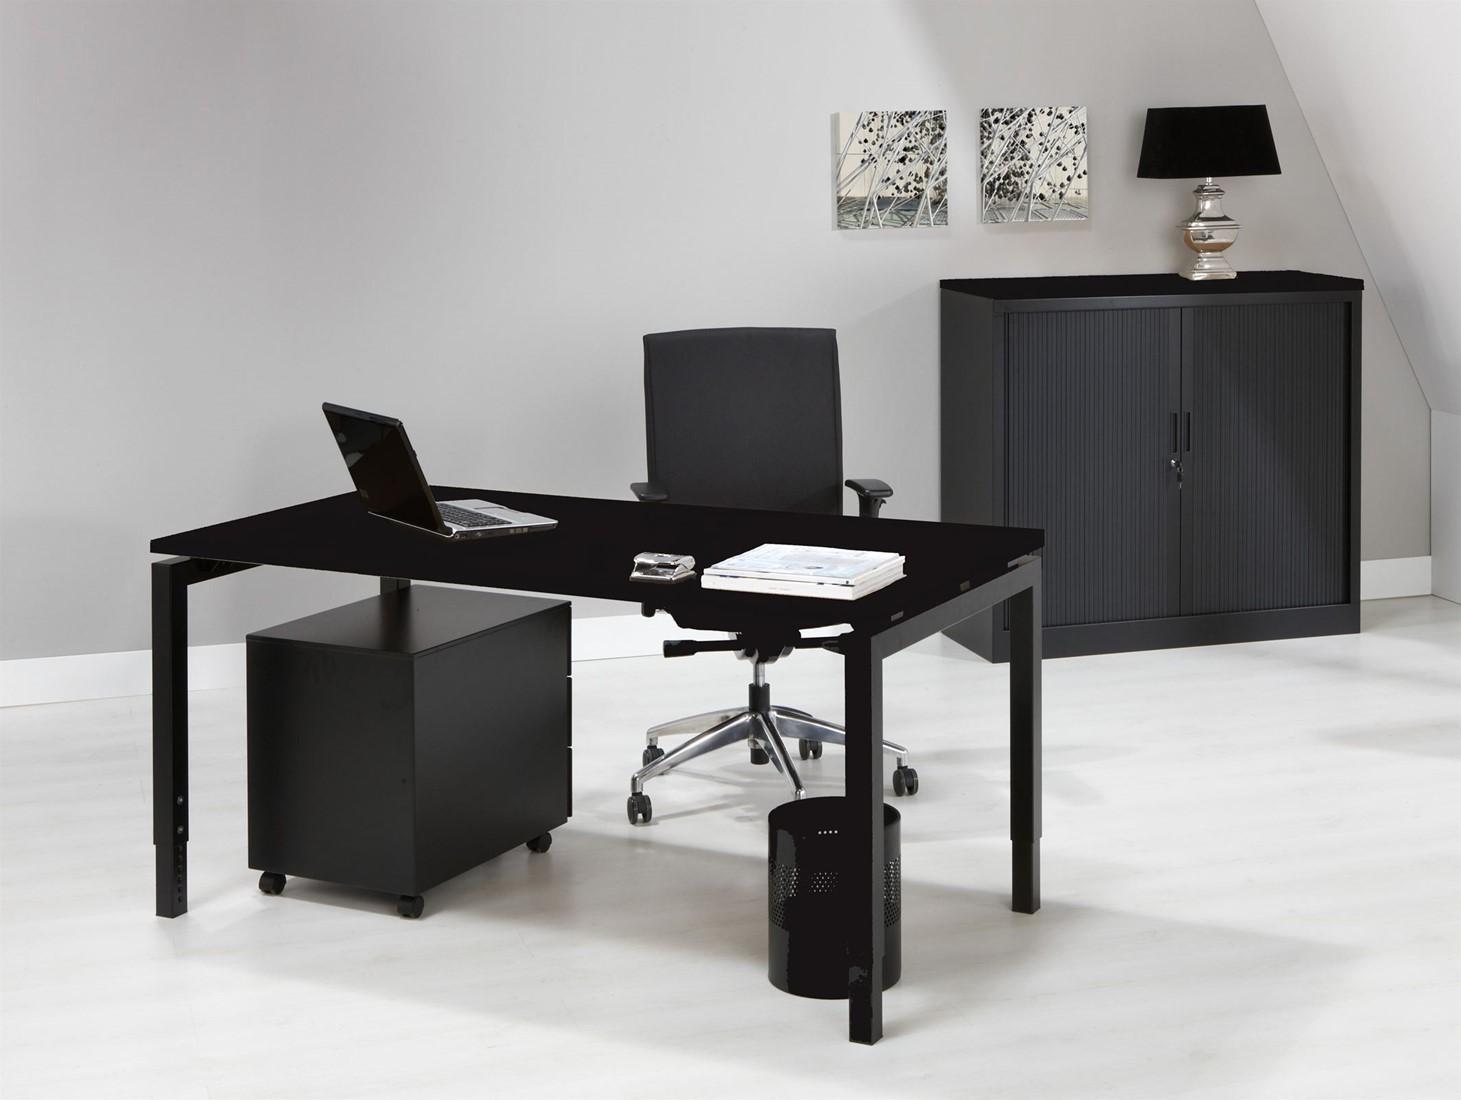 bureau zwart proline quad4 bij pro office. Black Bedroom Furniture Sets. Home Design Ideas